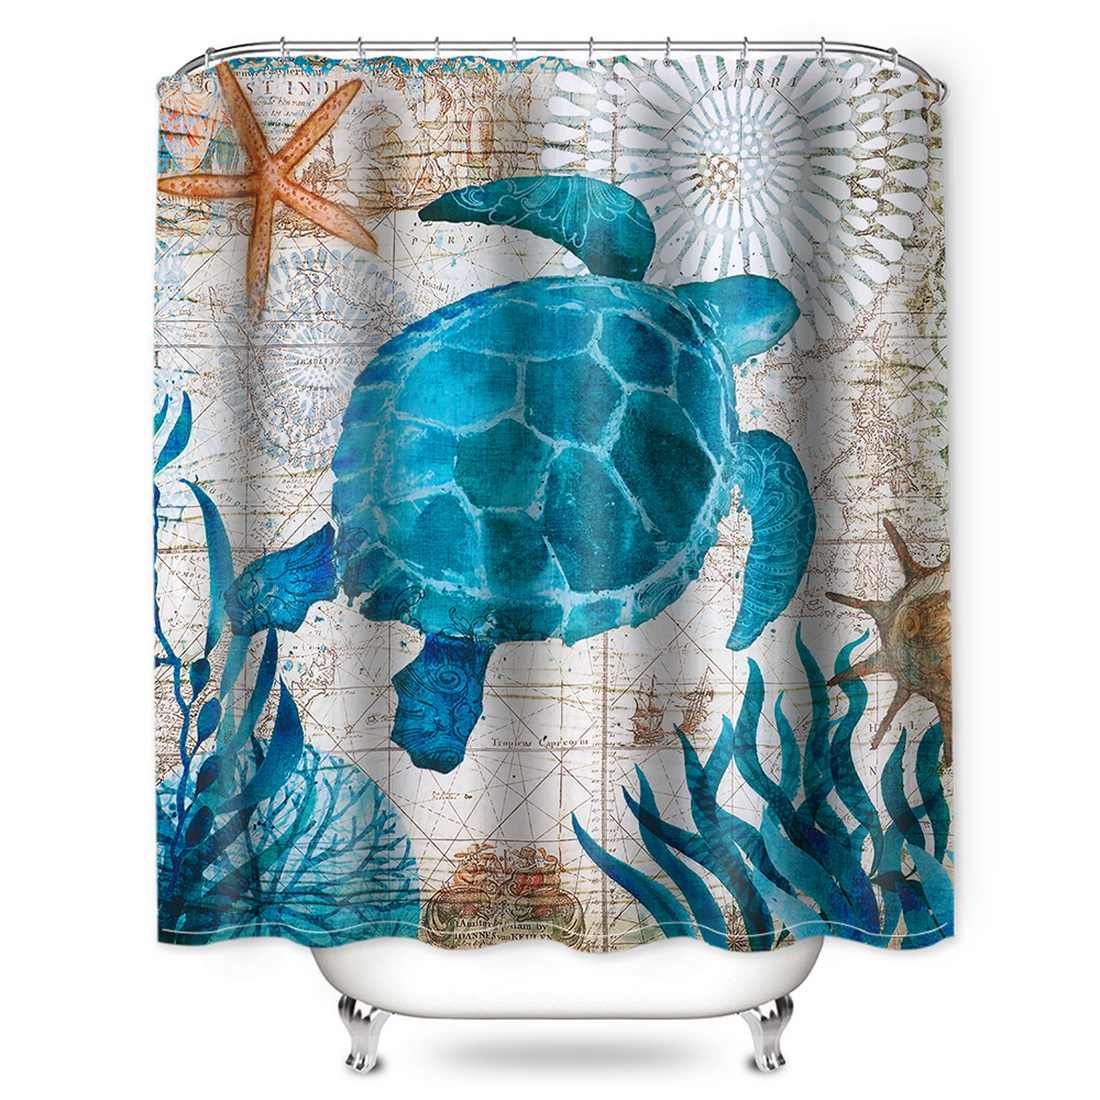 DIDIHOU עמיד למים מקלחת וילון עם ווים 3D נוף ציור הדפסת מקלחת וילון אמבטיה רחצה וילונות 180x180cm